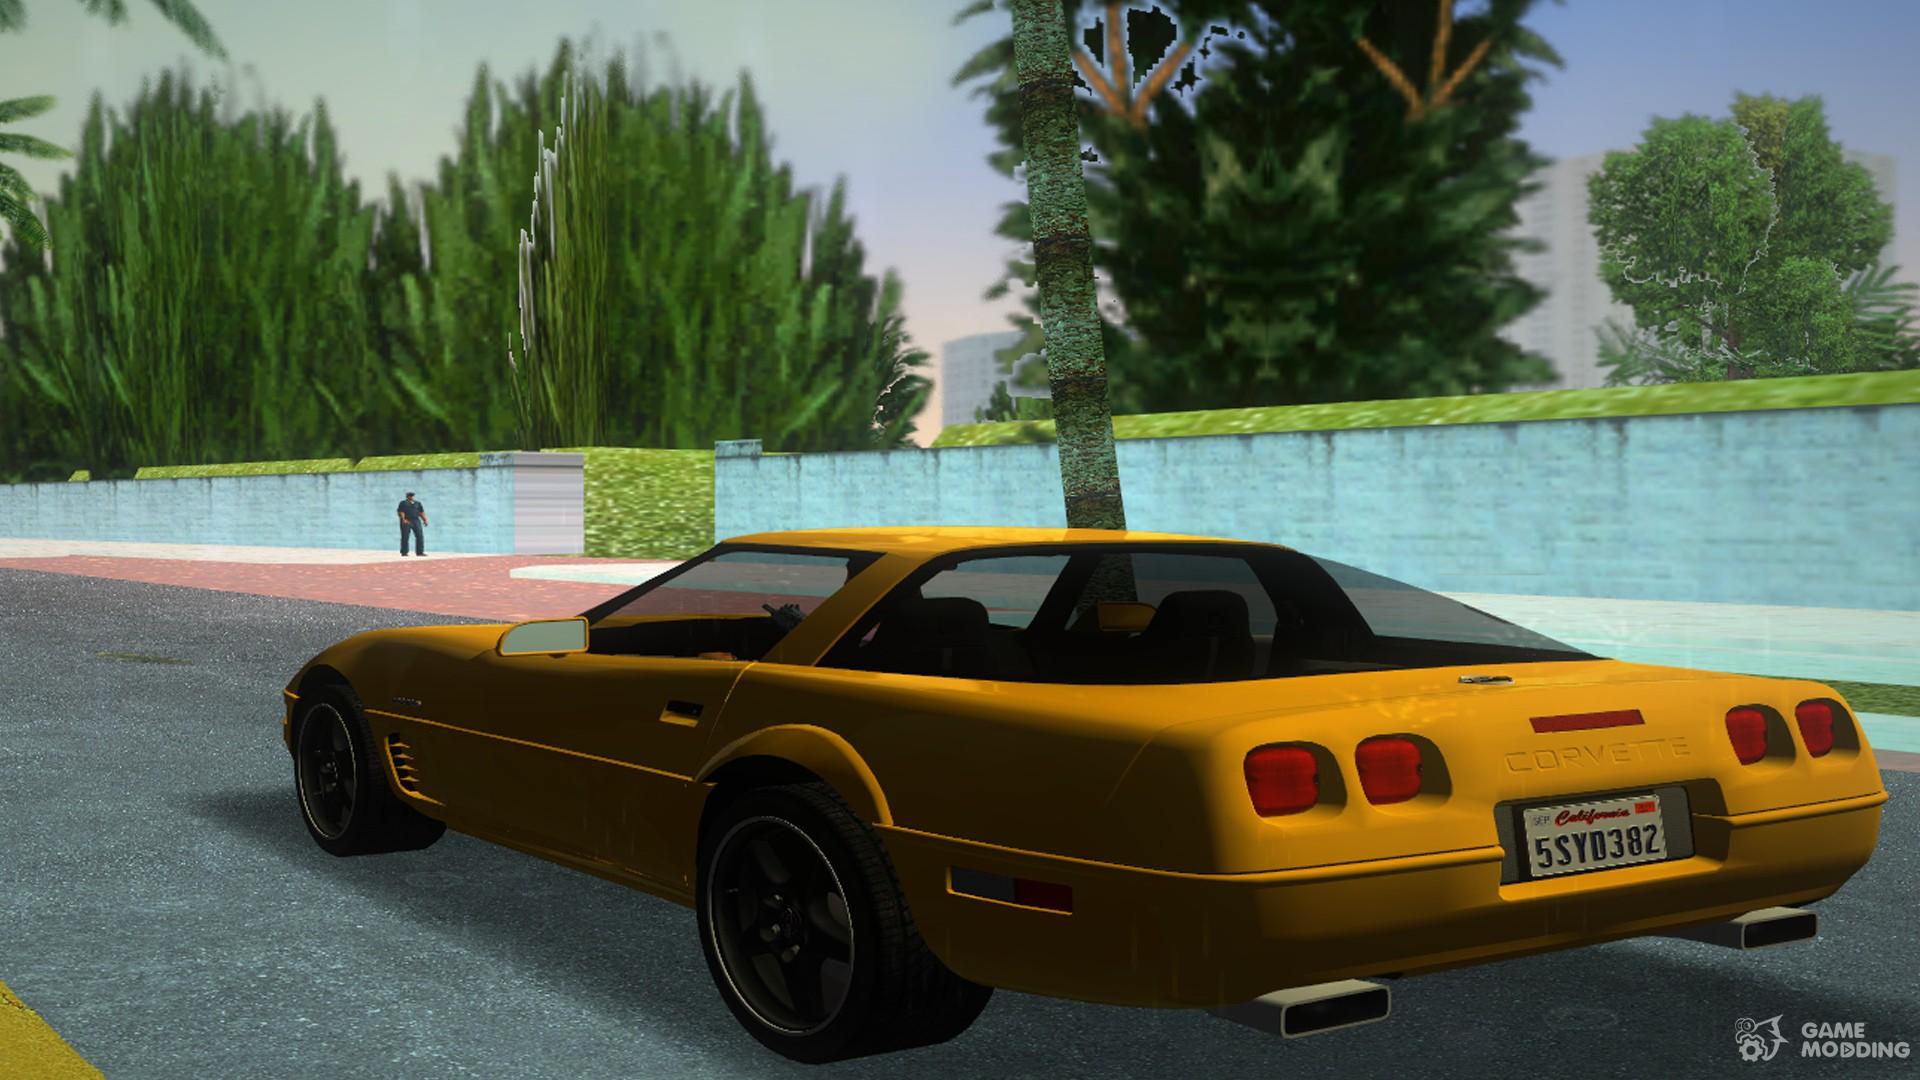 chevrolet corvette c4 96 for gta vice city. Black Bedroom Furniture Sets. Home Design Ideas